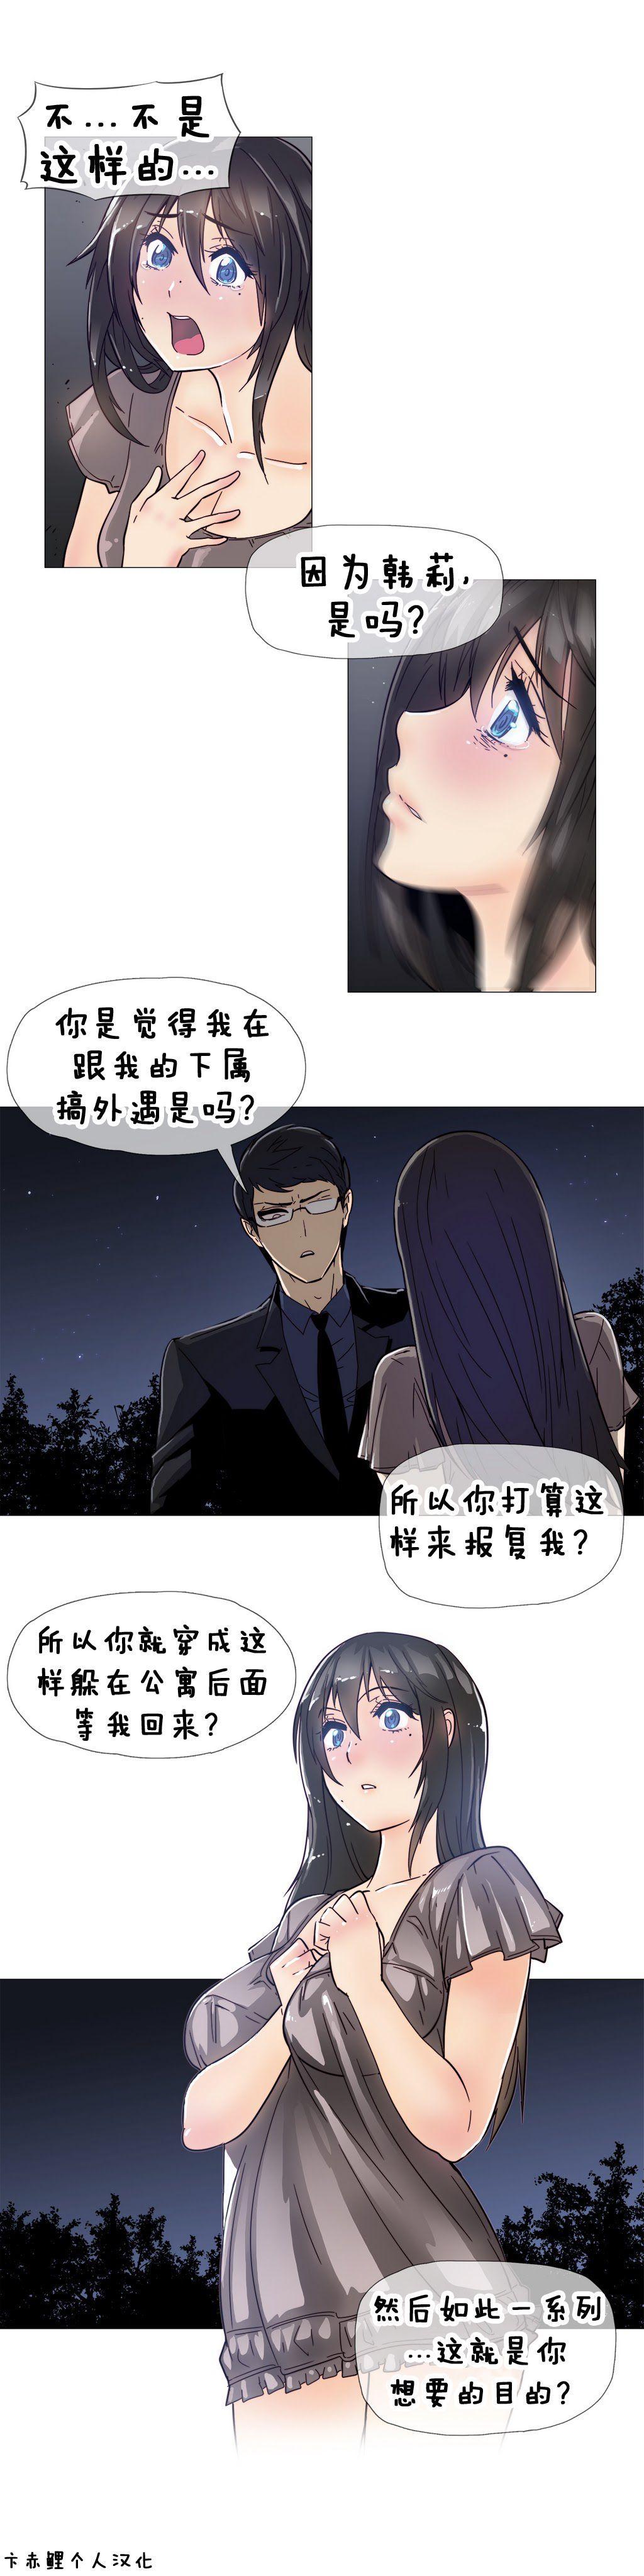 HouseHold Affairs 【卞赤鲤个人汉化】1~33话(持续更新中) 226